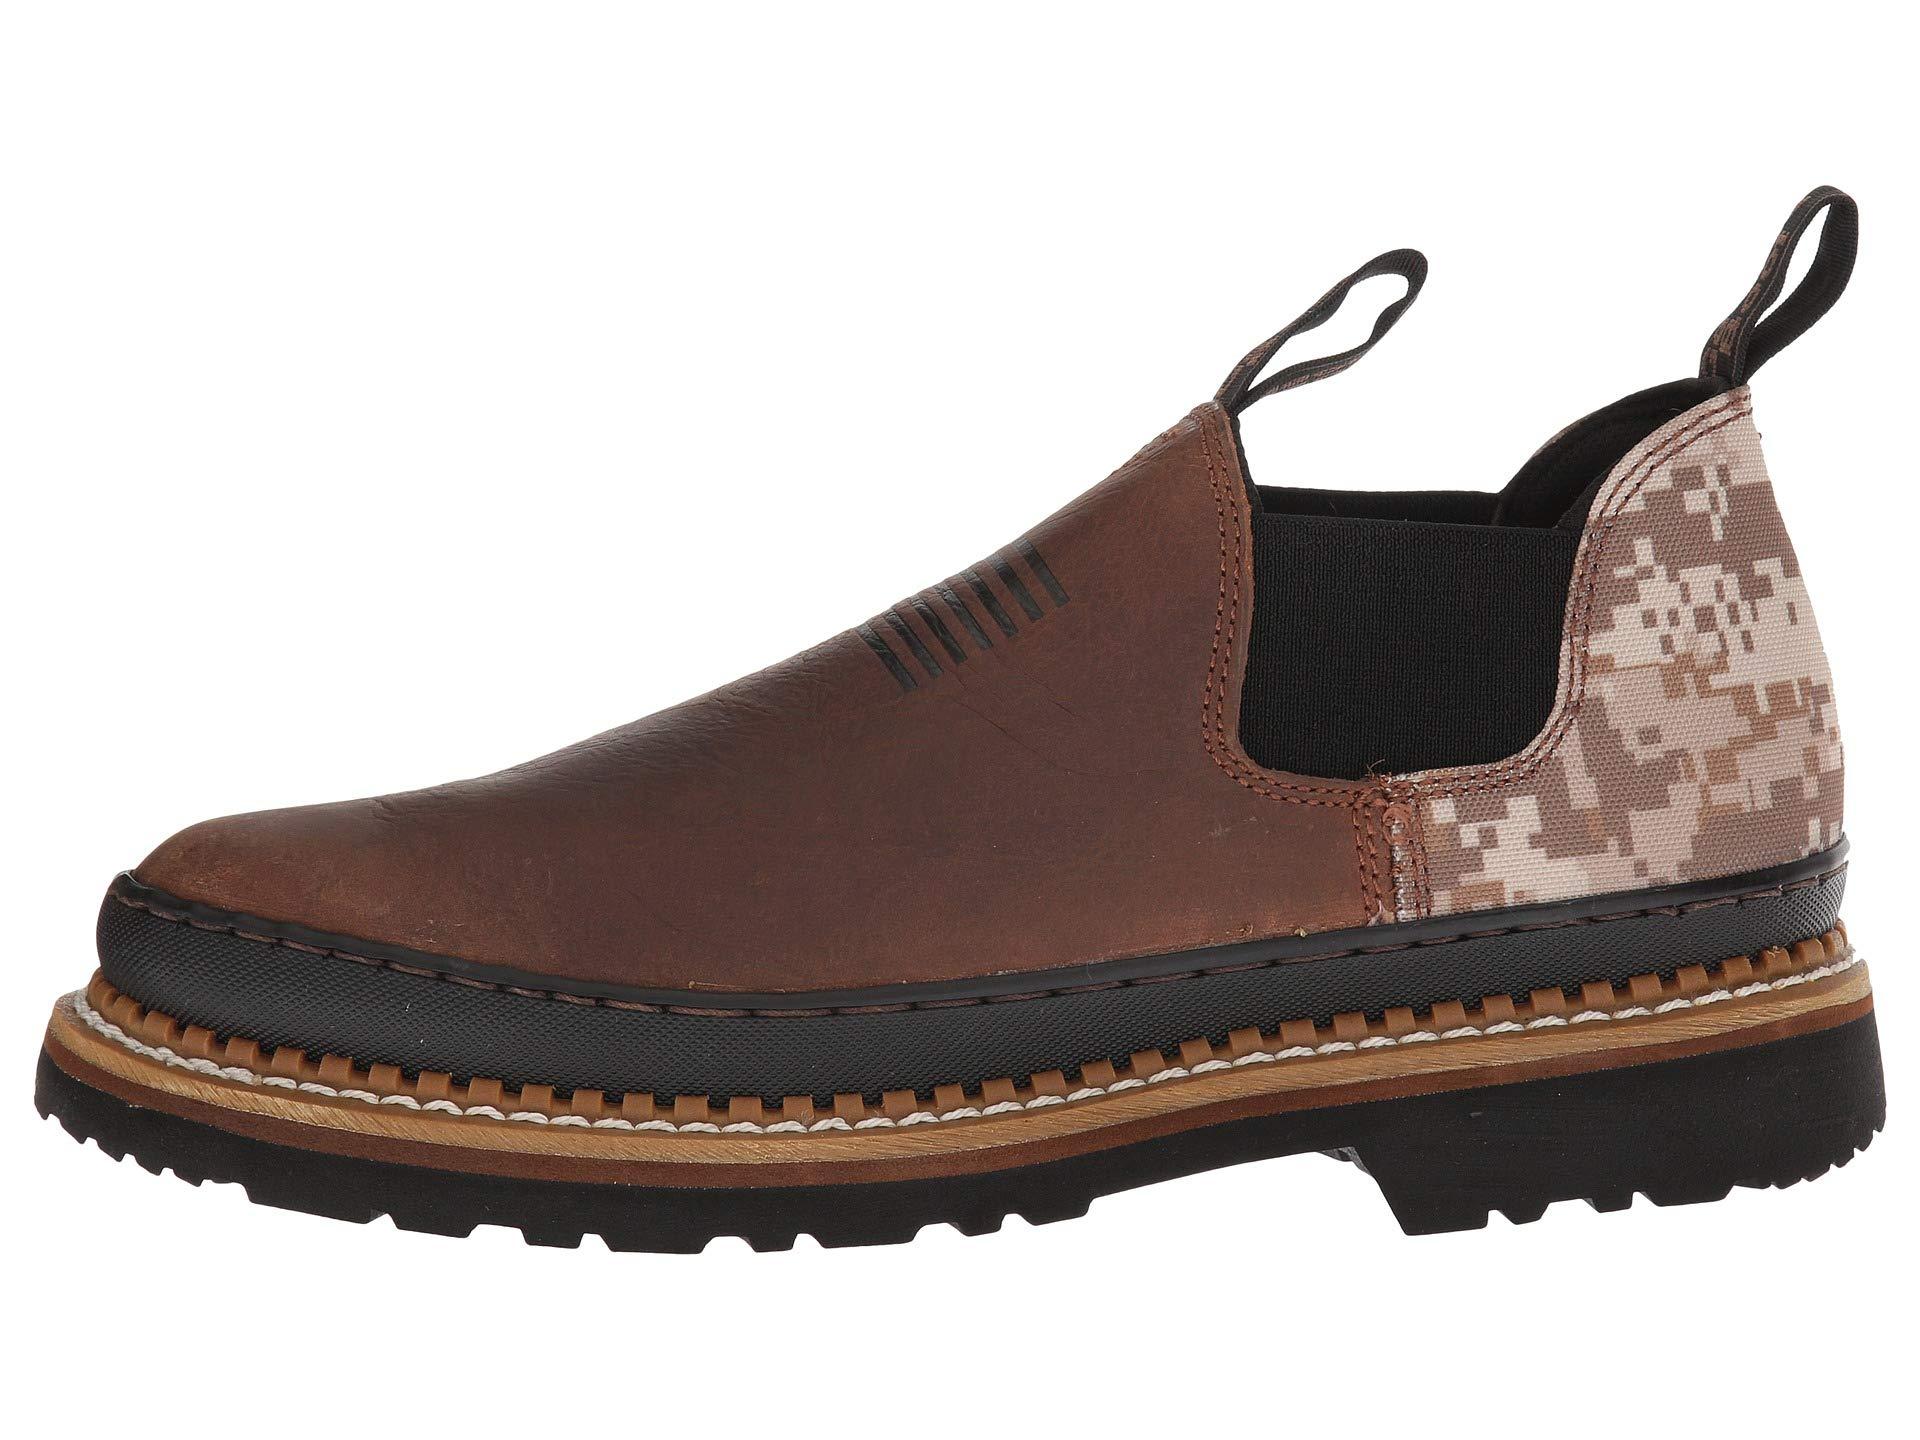 Camo camo Georgia Brown Romeo Desert Boot Giant rvxYFnx0